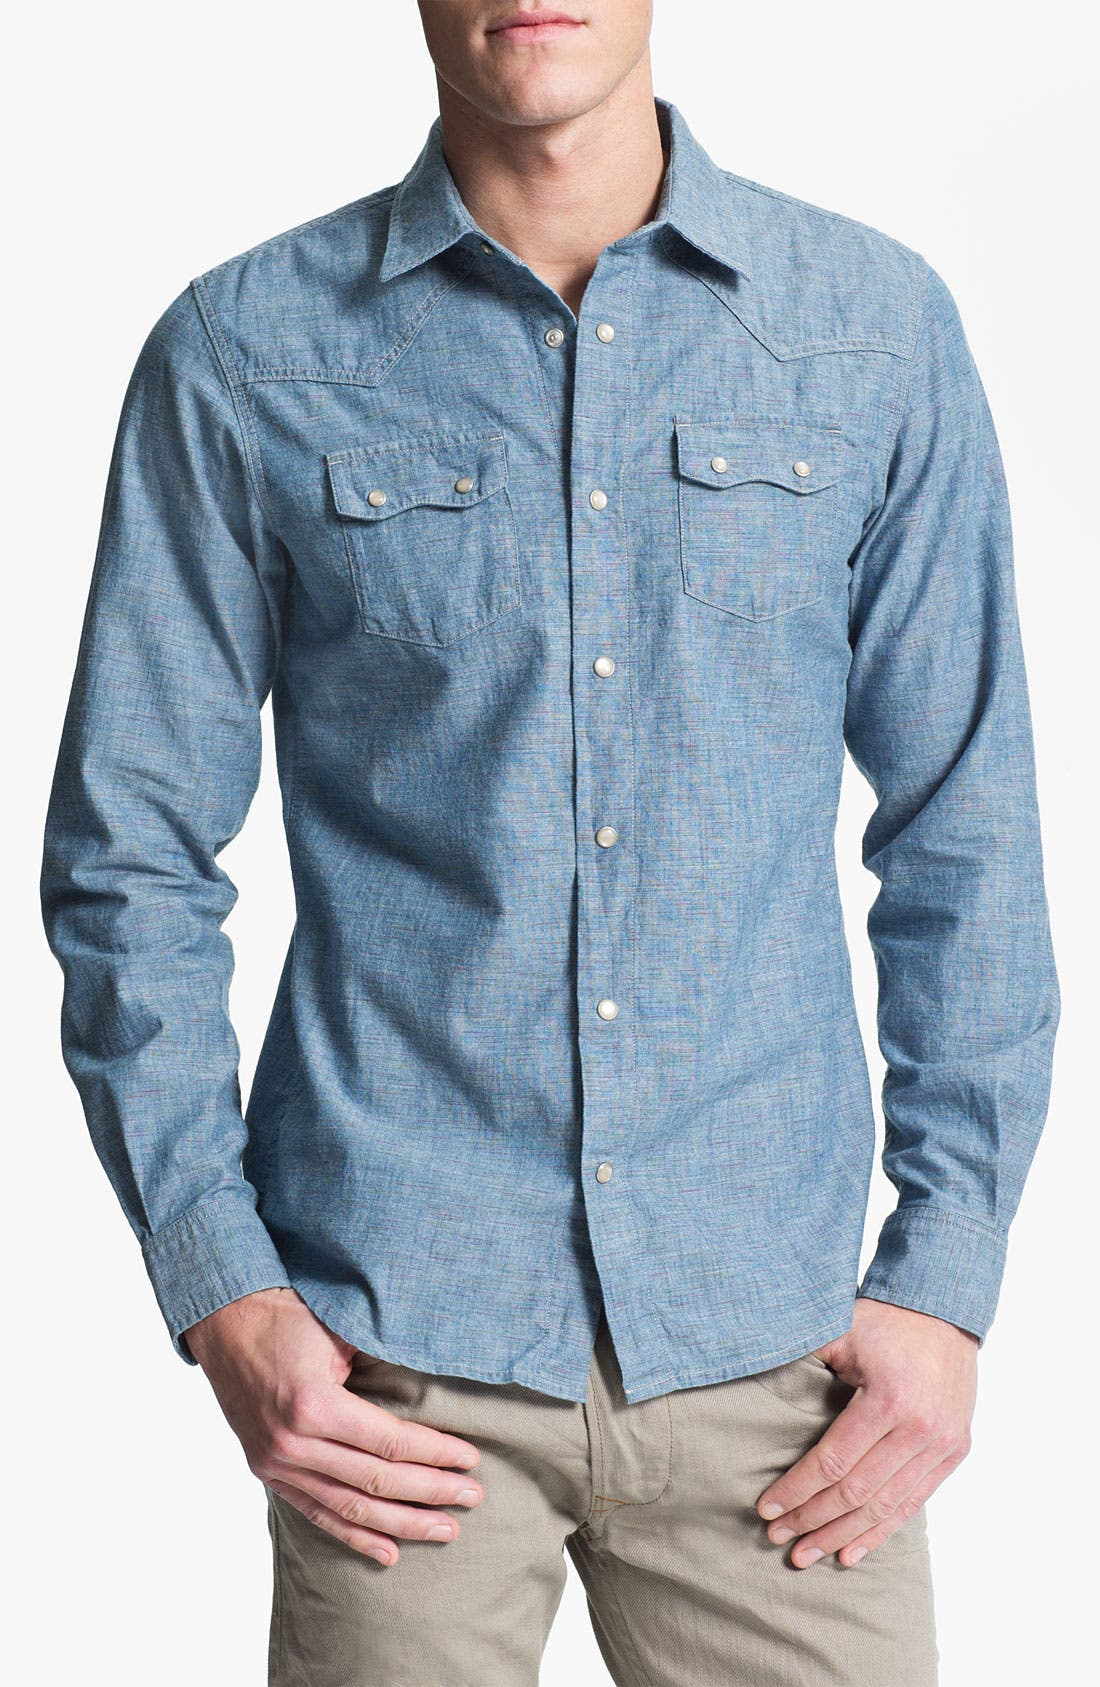 Main Image - 55DSL 'Saloon' Slub Chambray Western Shirt